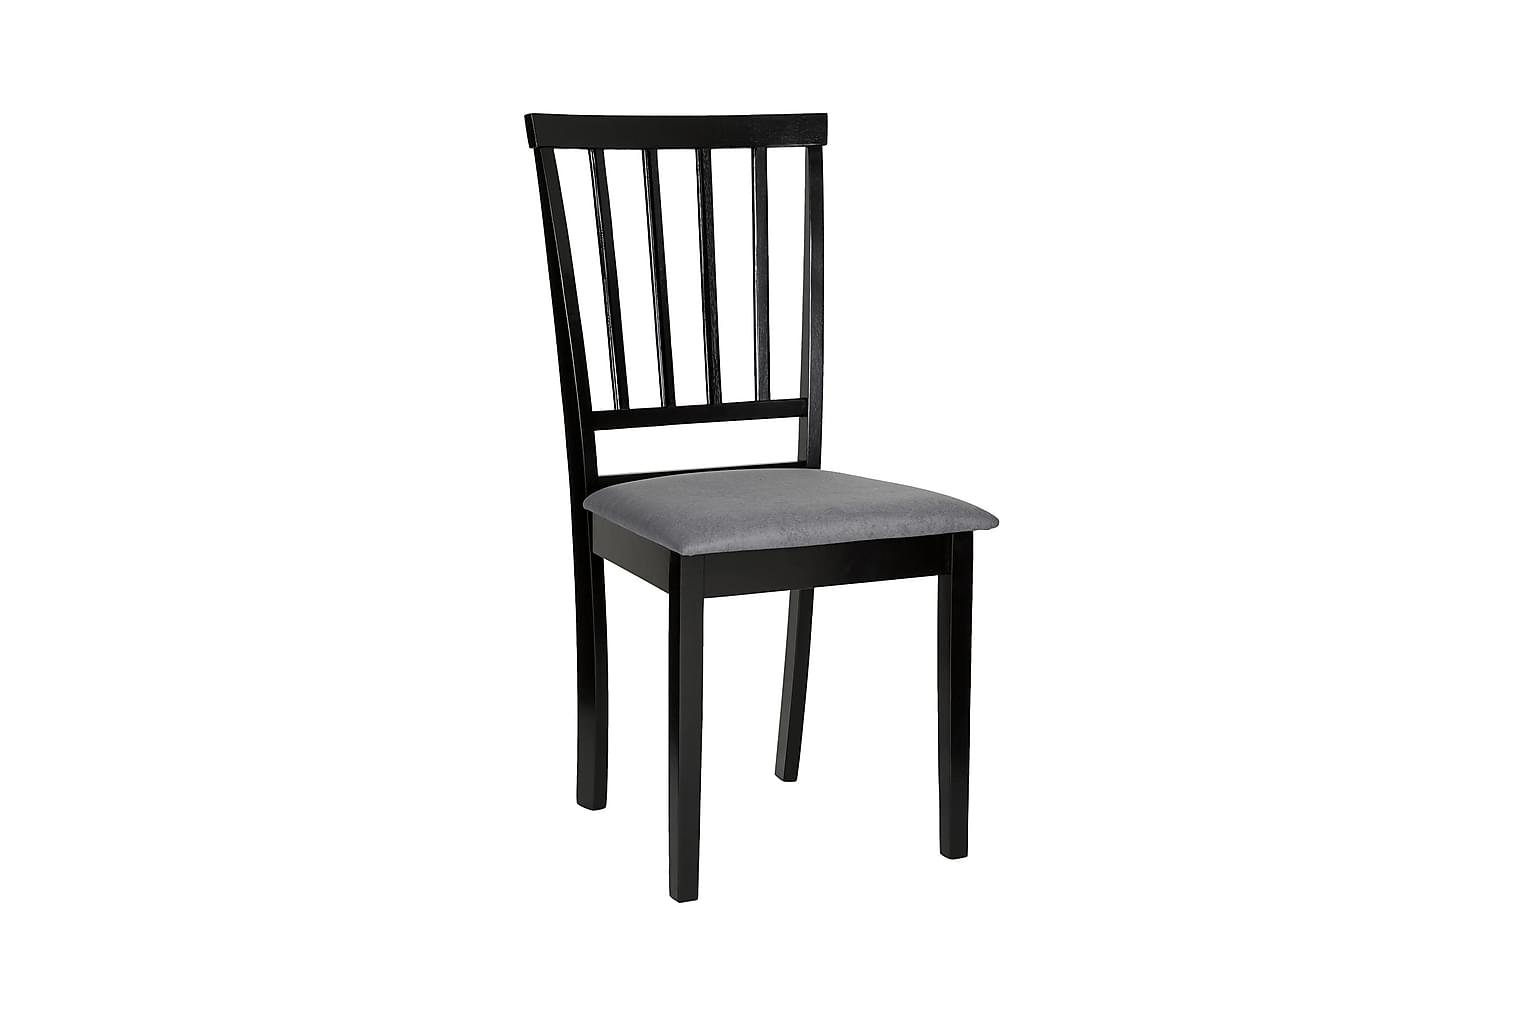 ALICE Tuoli Musta/Harmaa